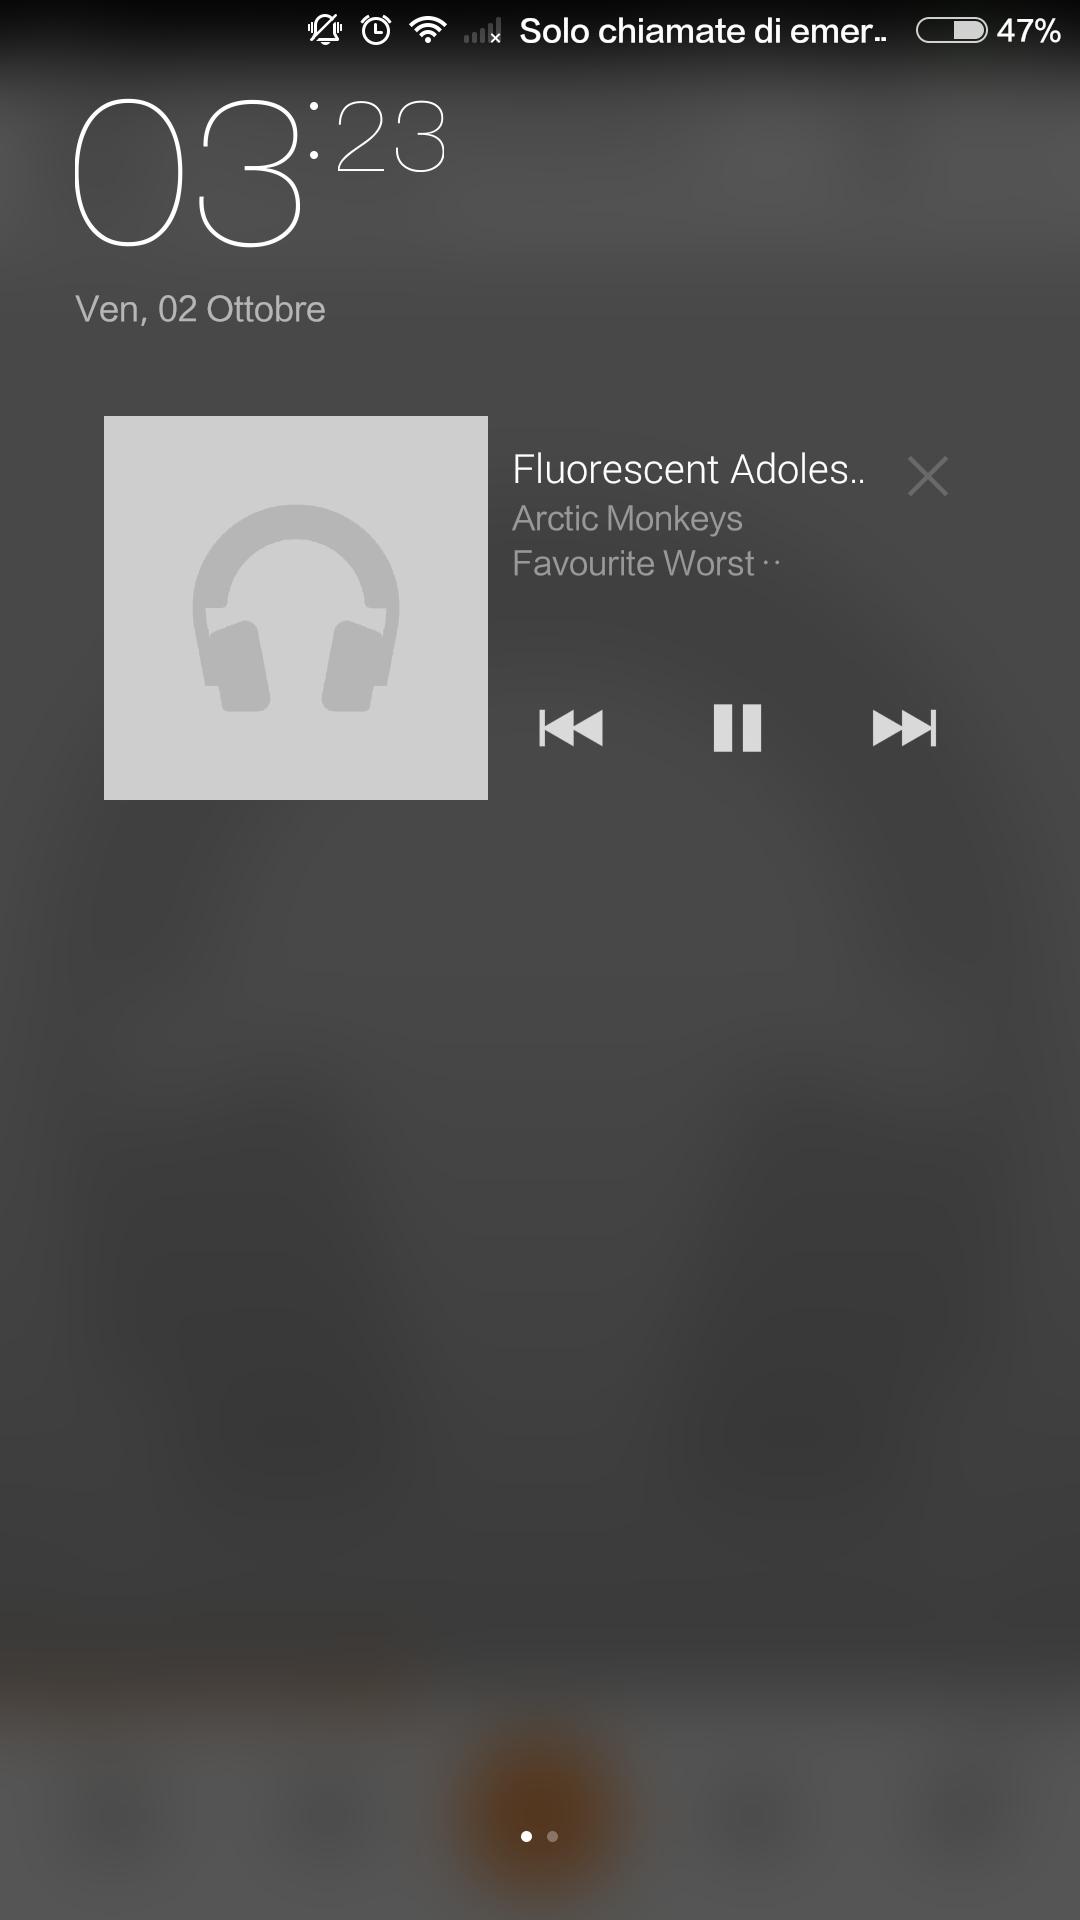 Screenshot_com.google.android.music_2015-10-02-03-23-40